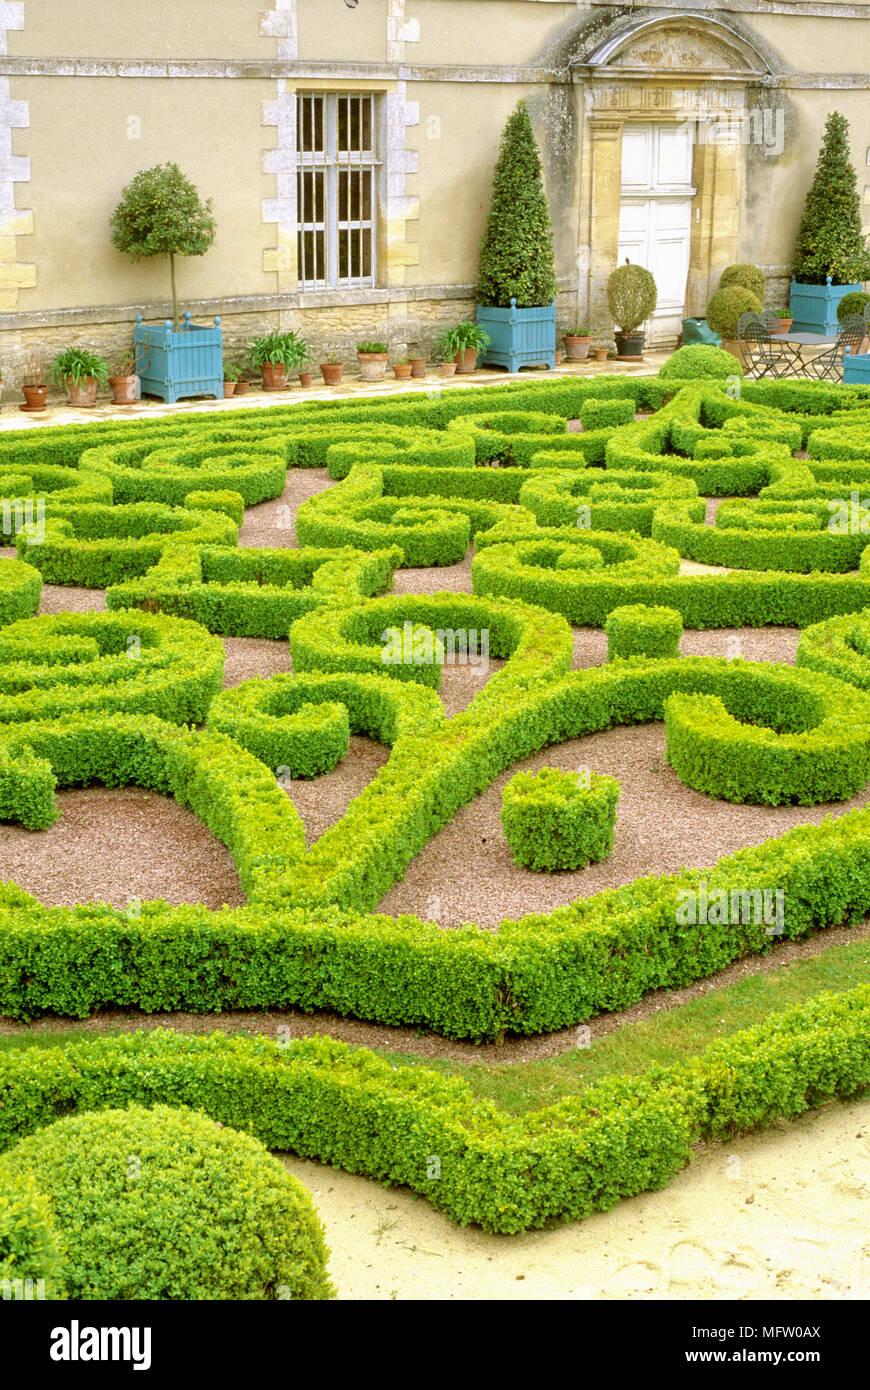 Formal Buxus Topiary Garden Stock Photo Alamy